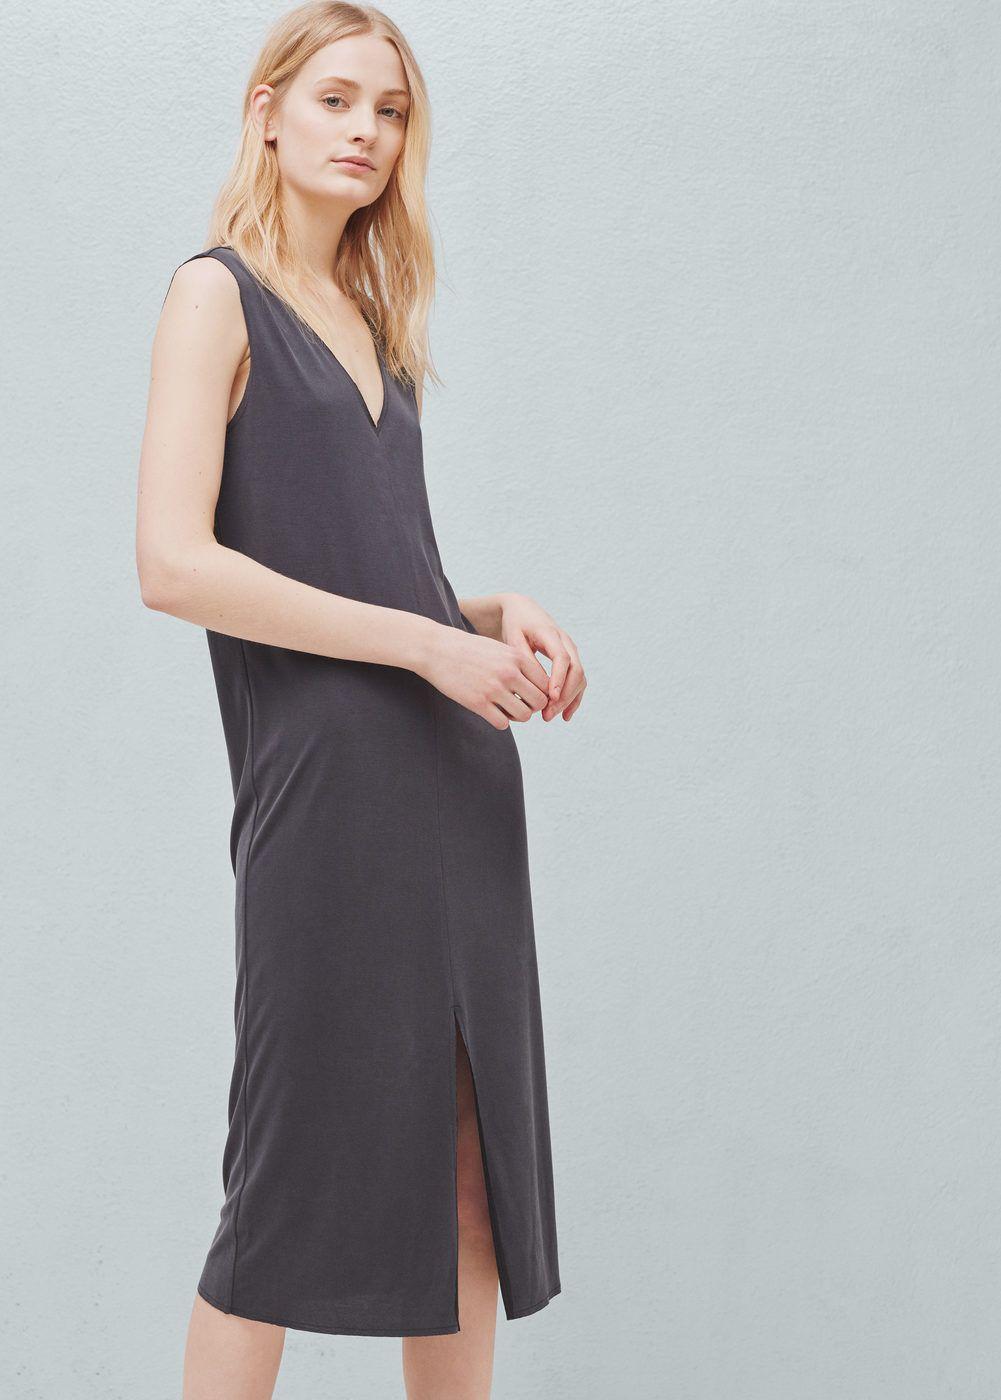 2022950b6bb Vestido de modal - Vestidos de Mulher